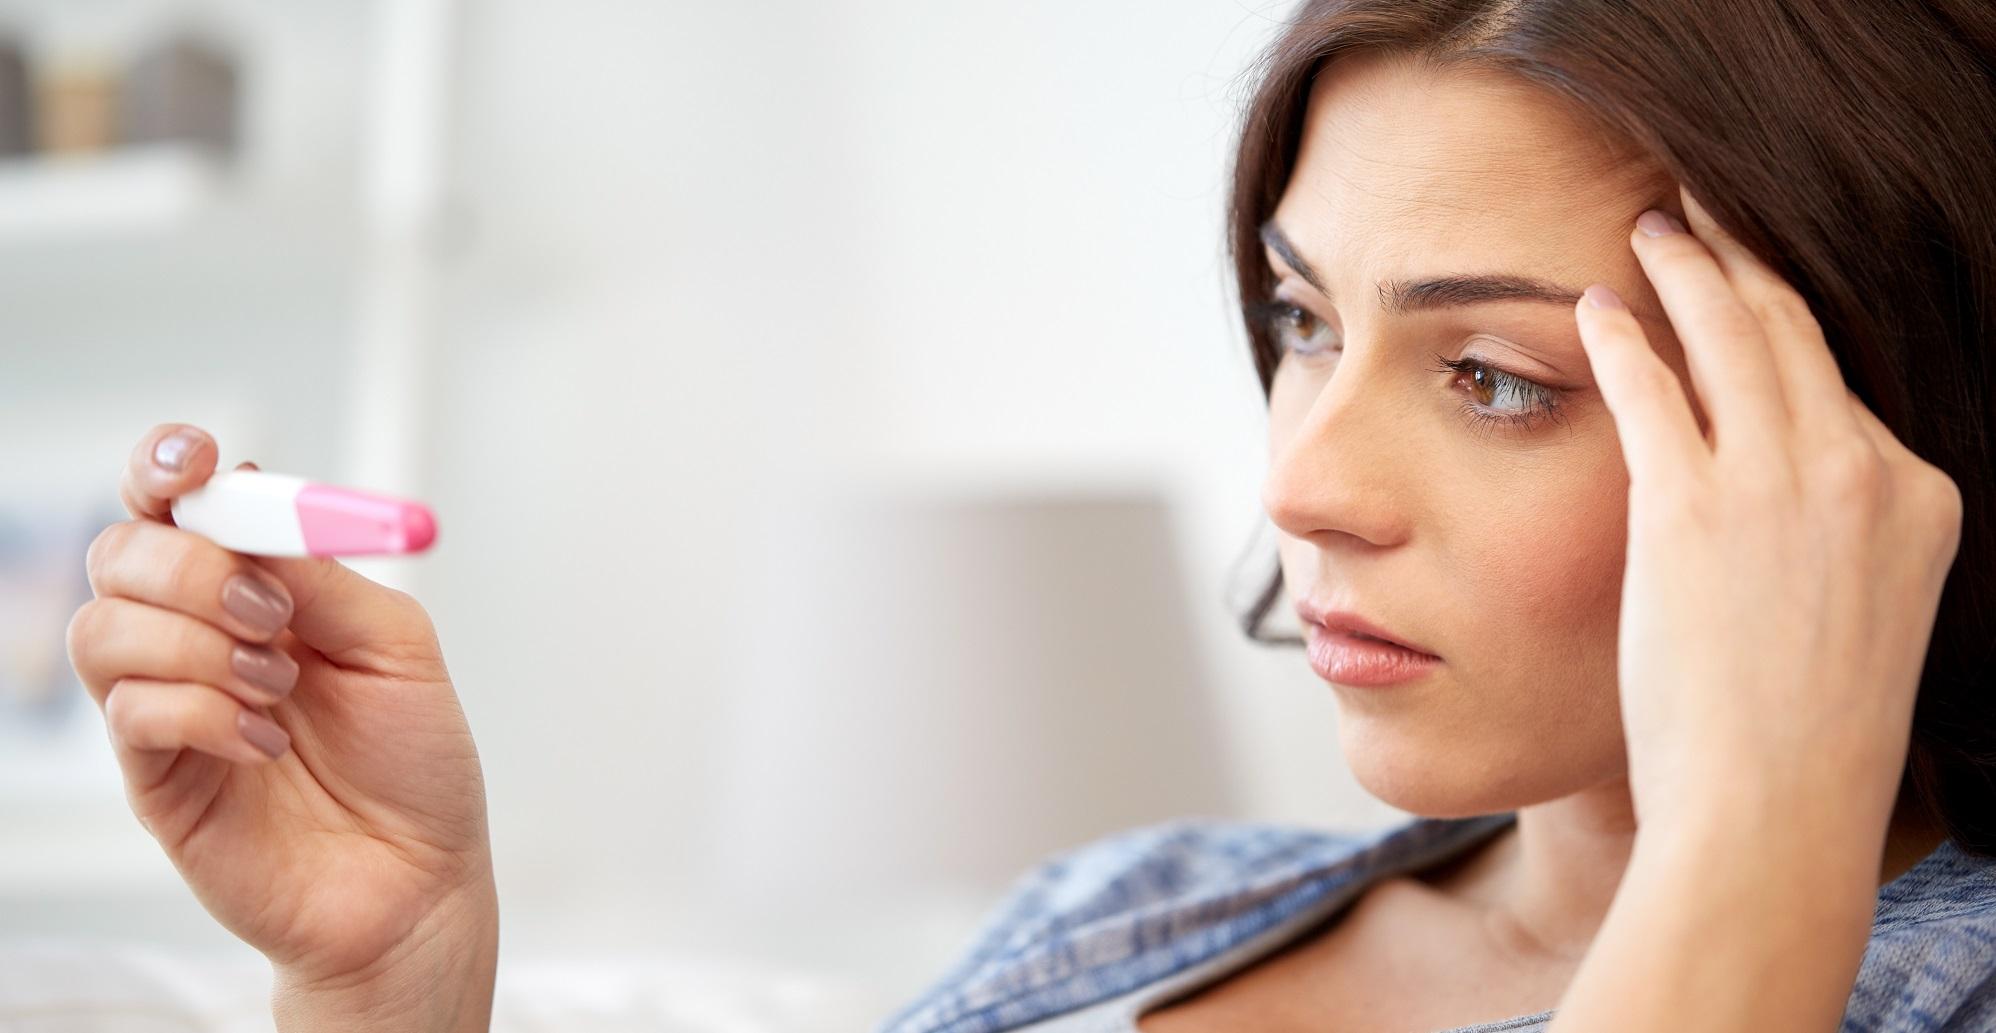 Conception increse intercourse masturbation female after